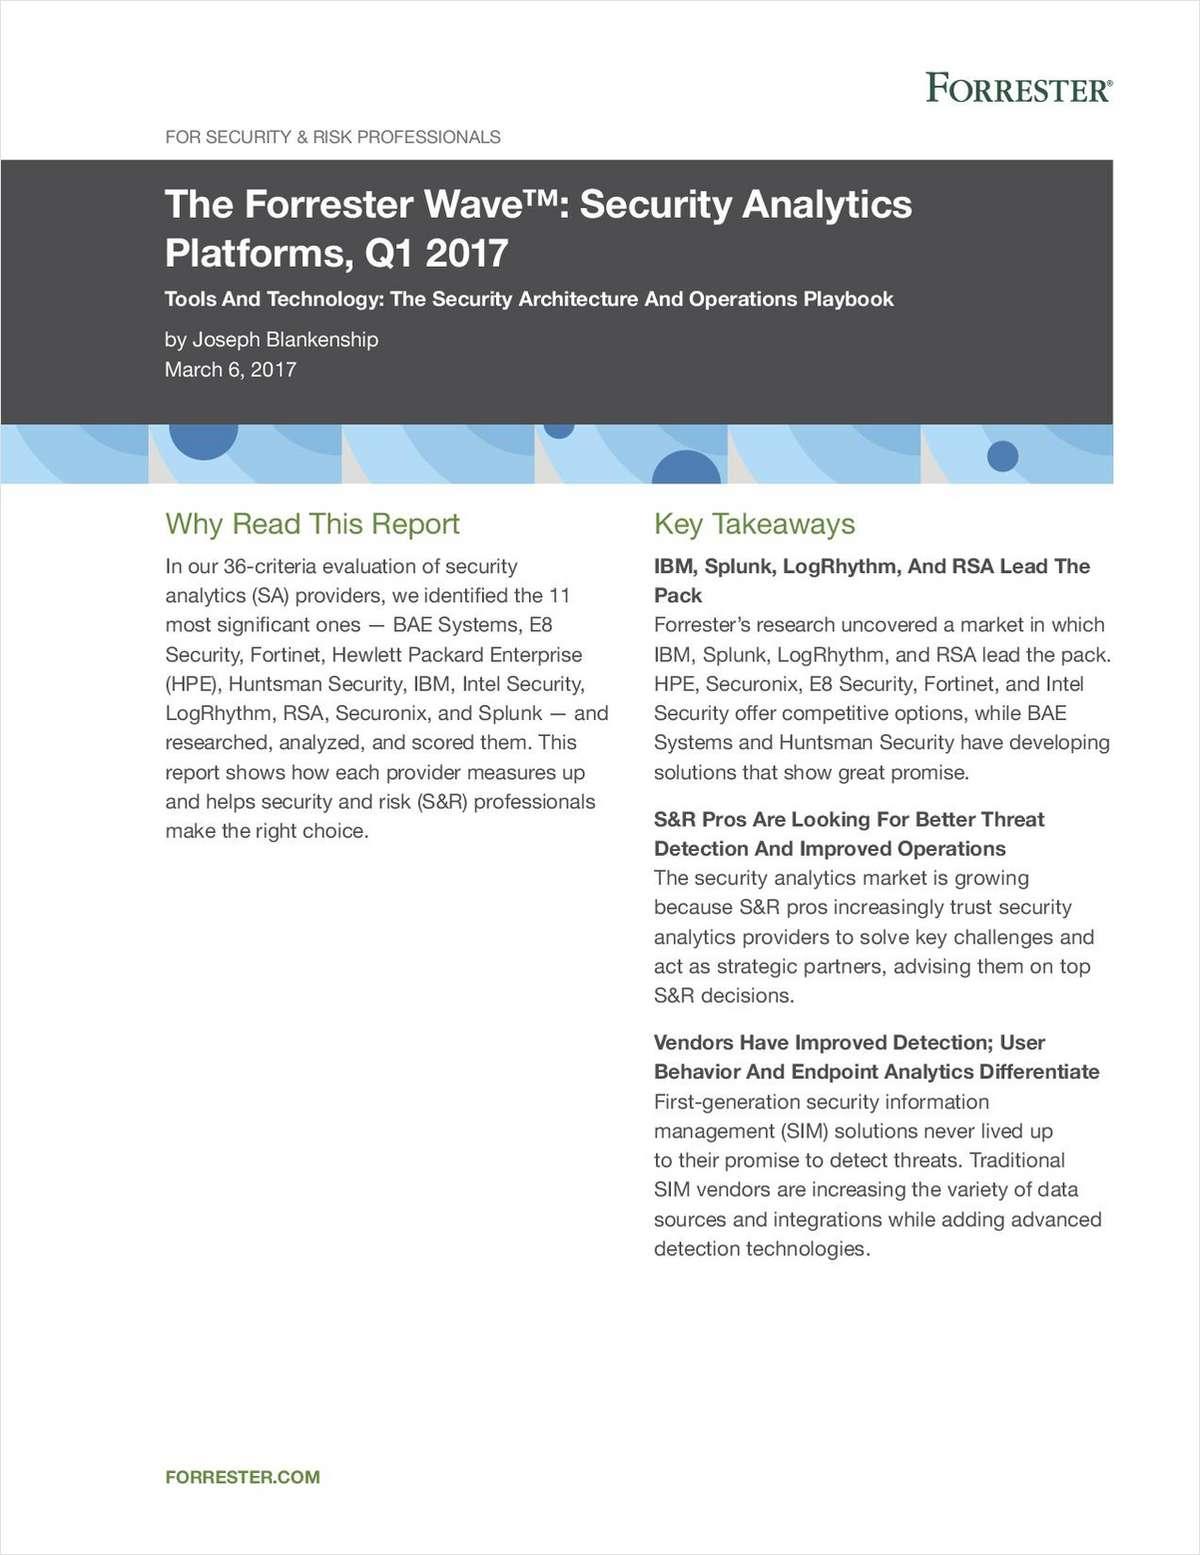 Forrester Wave: Security Analytics Platforms, Q1 2017